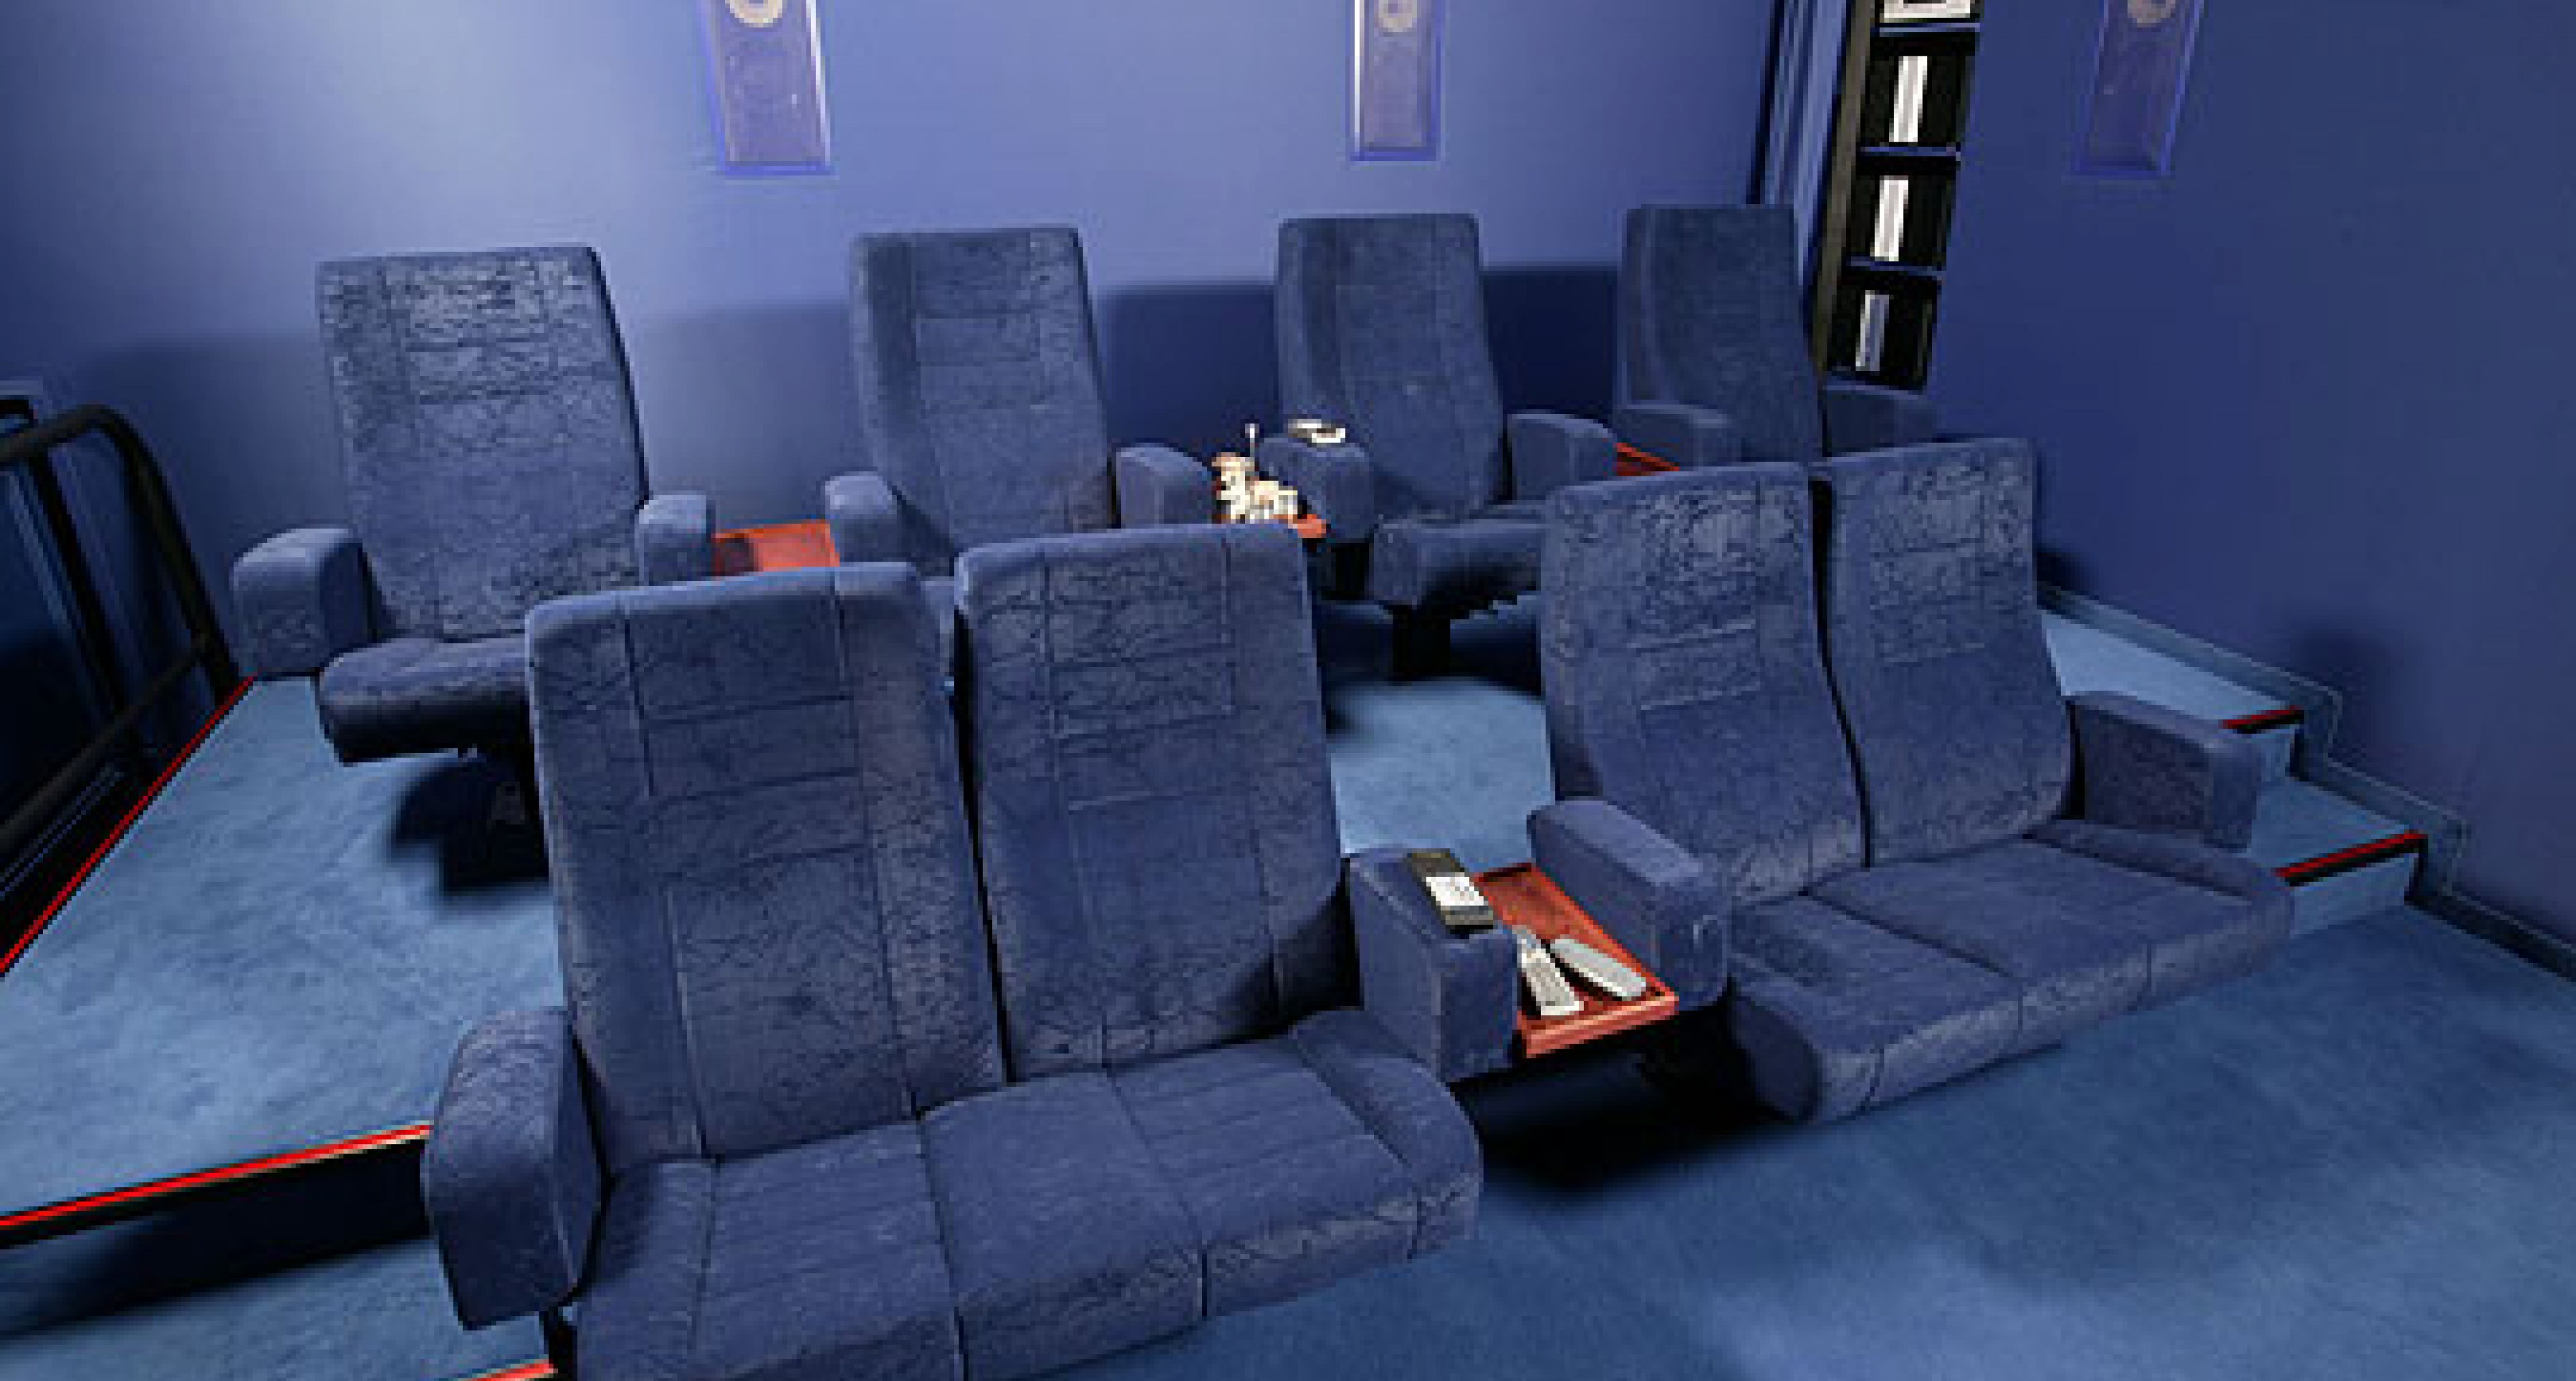 Kempinski Hotel Atlantic PrivateMax: Persönliches Kinoerlebnis